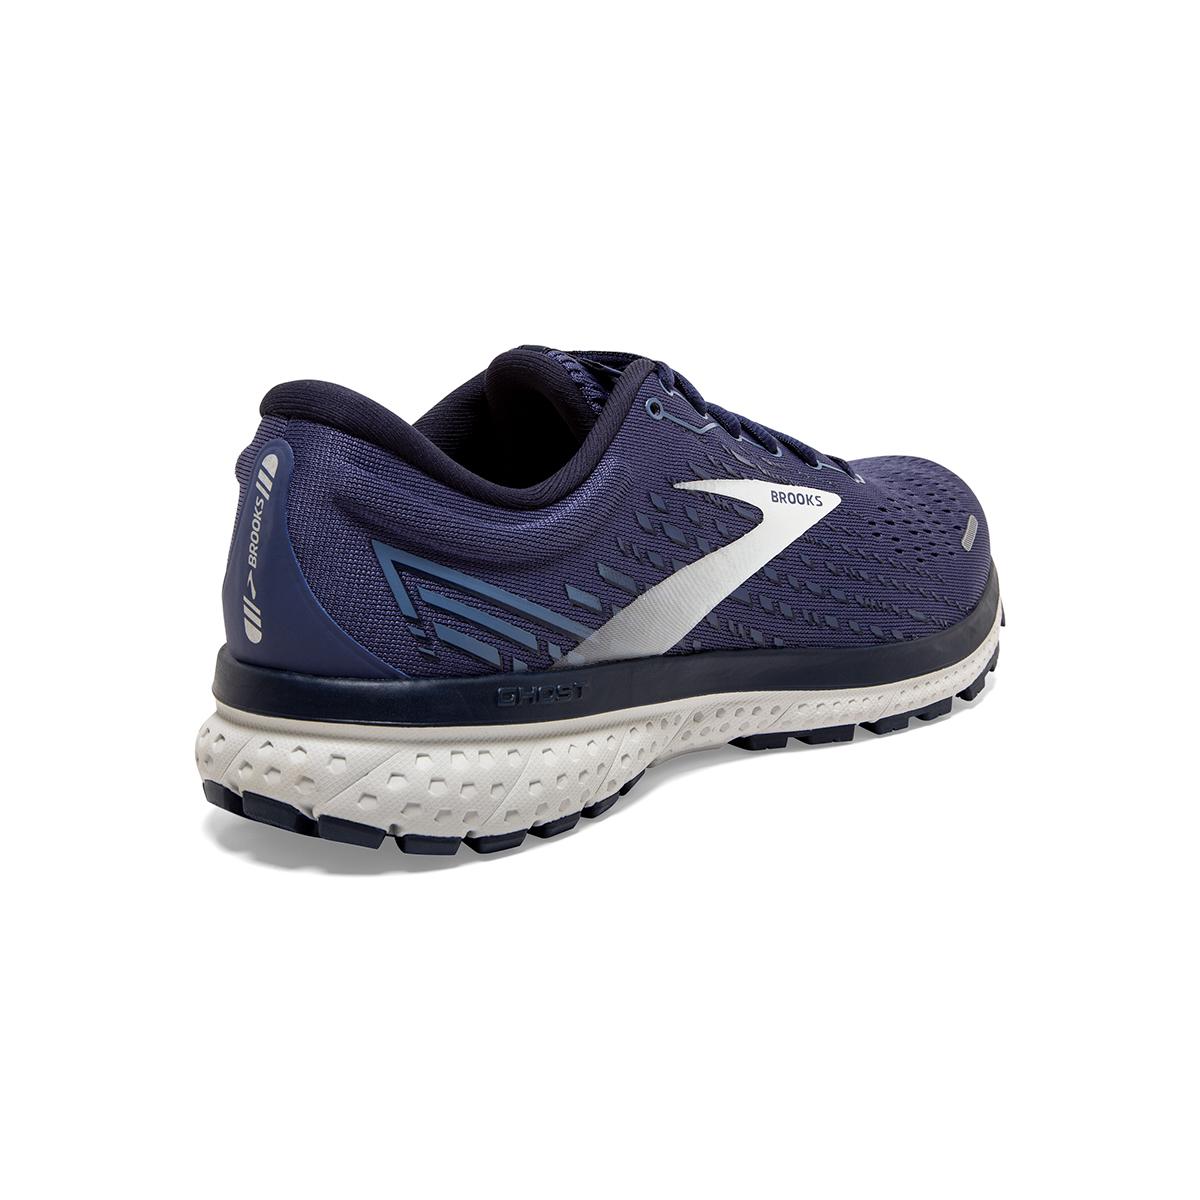 Men's Brooks Ghost 13 Running Shoe - Color: Deep Cobalt/Grey - Size: 7 - Width: Regular, Deep Cobalt/Grey, large, image 6